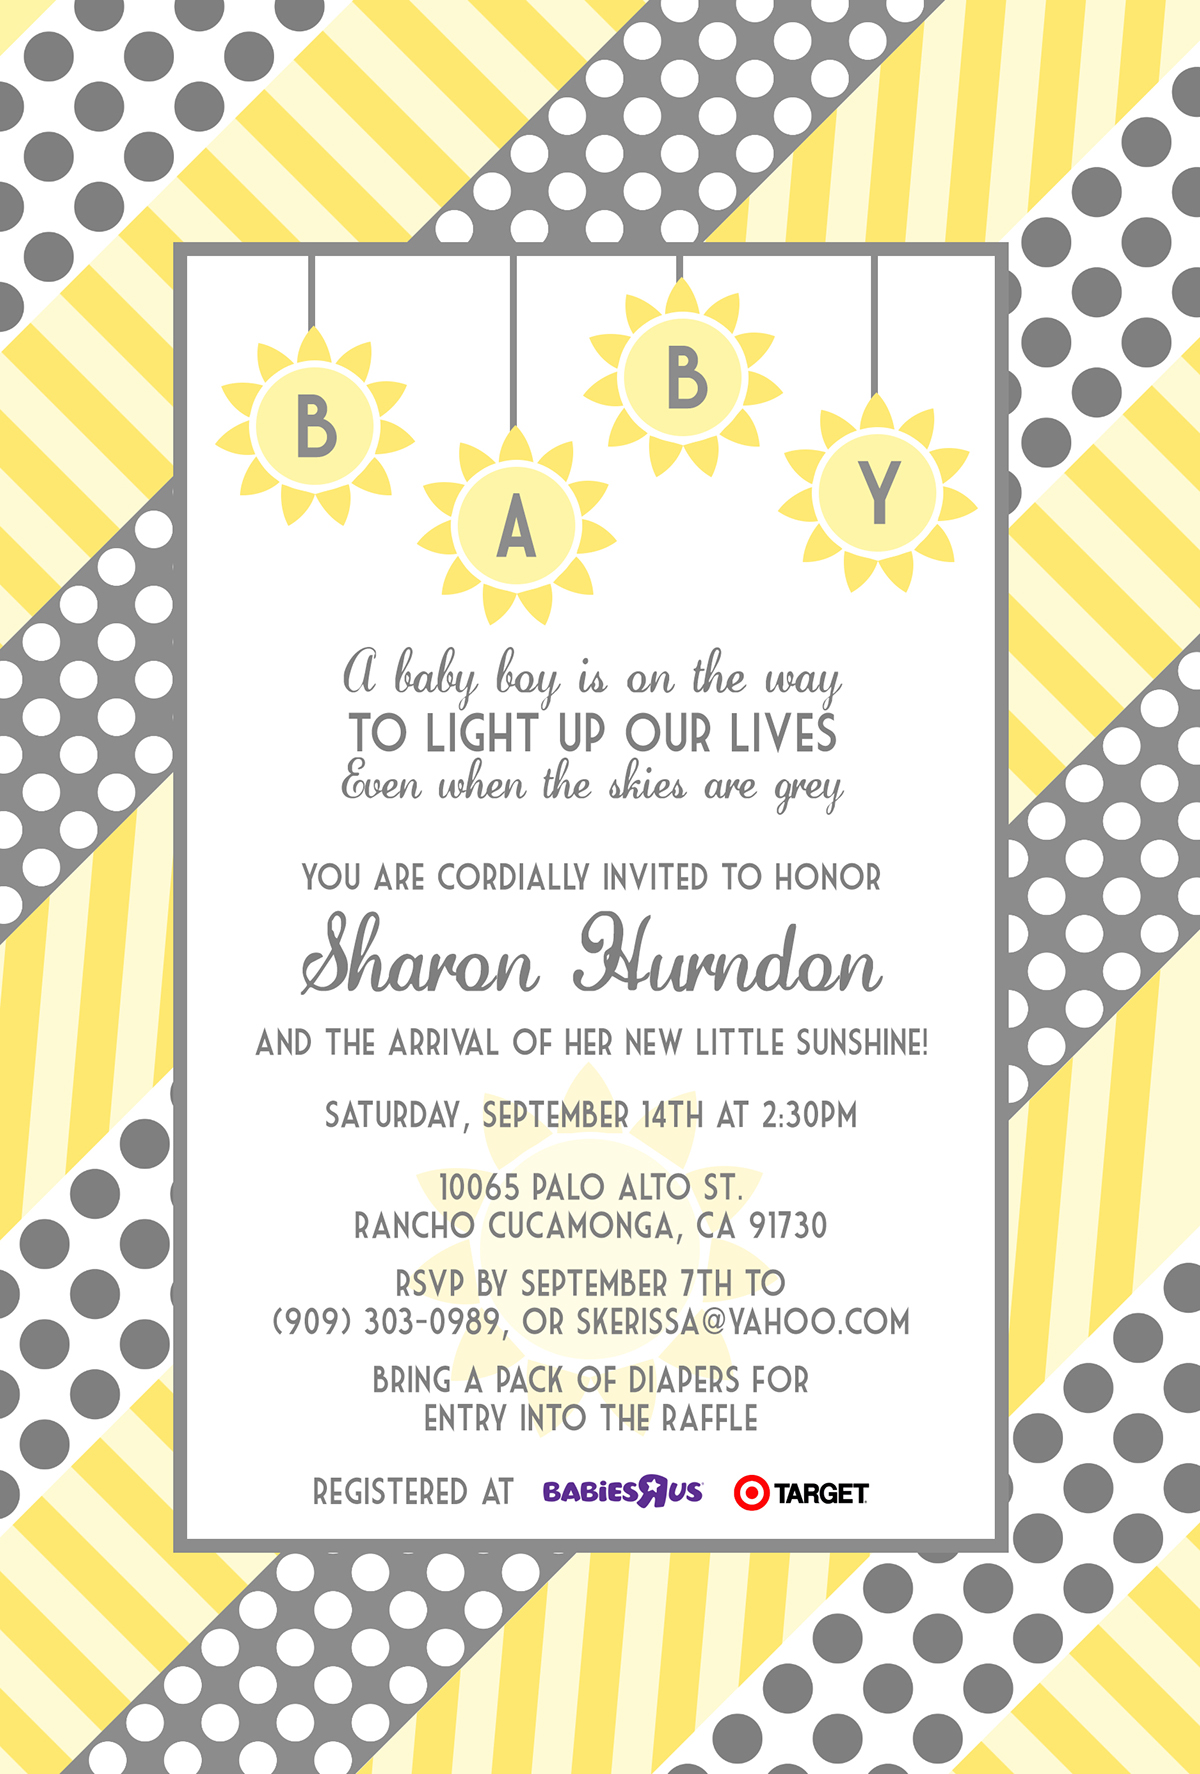 Sharon Baby Shower yellow polka dots grey